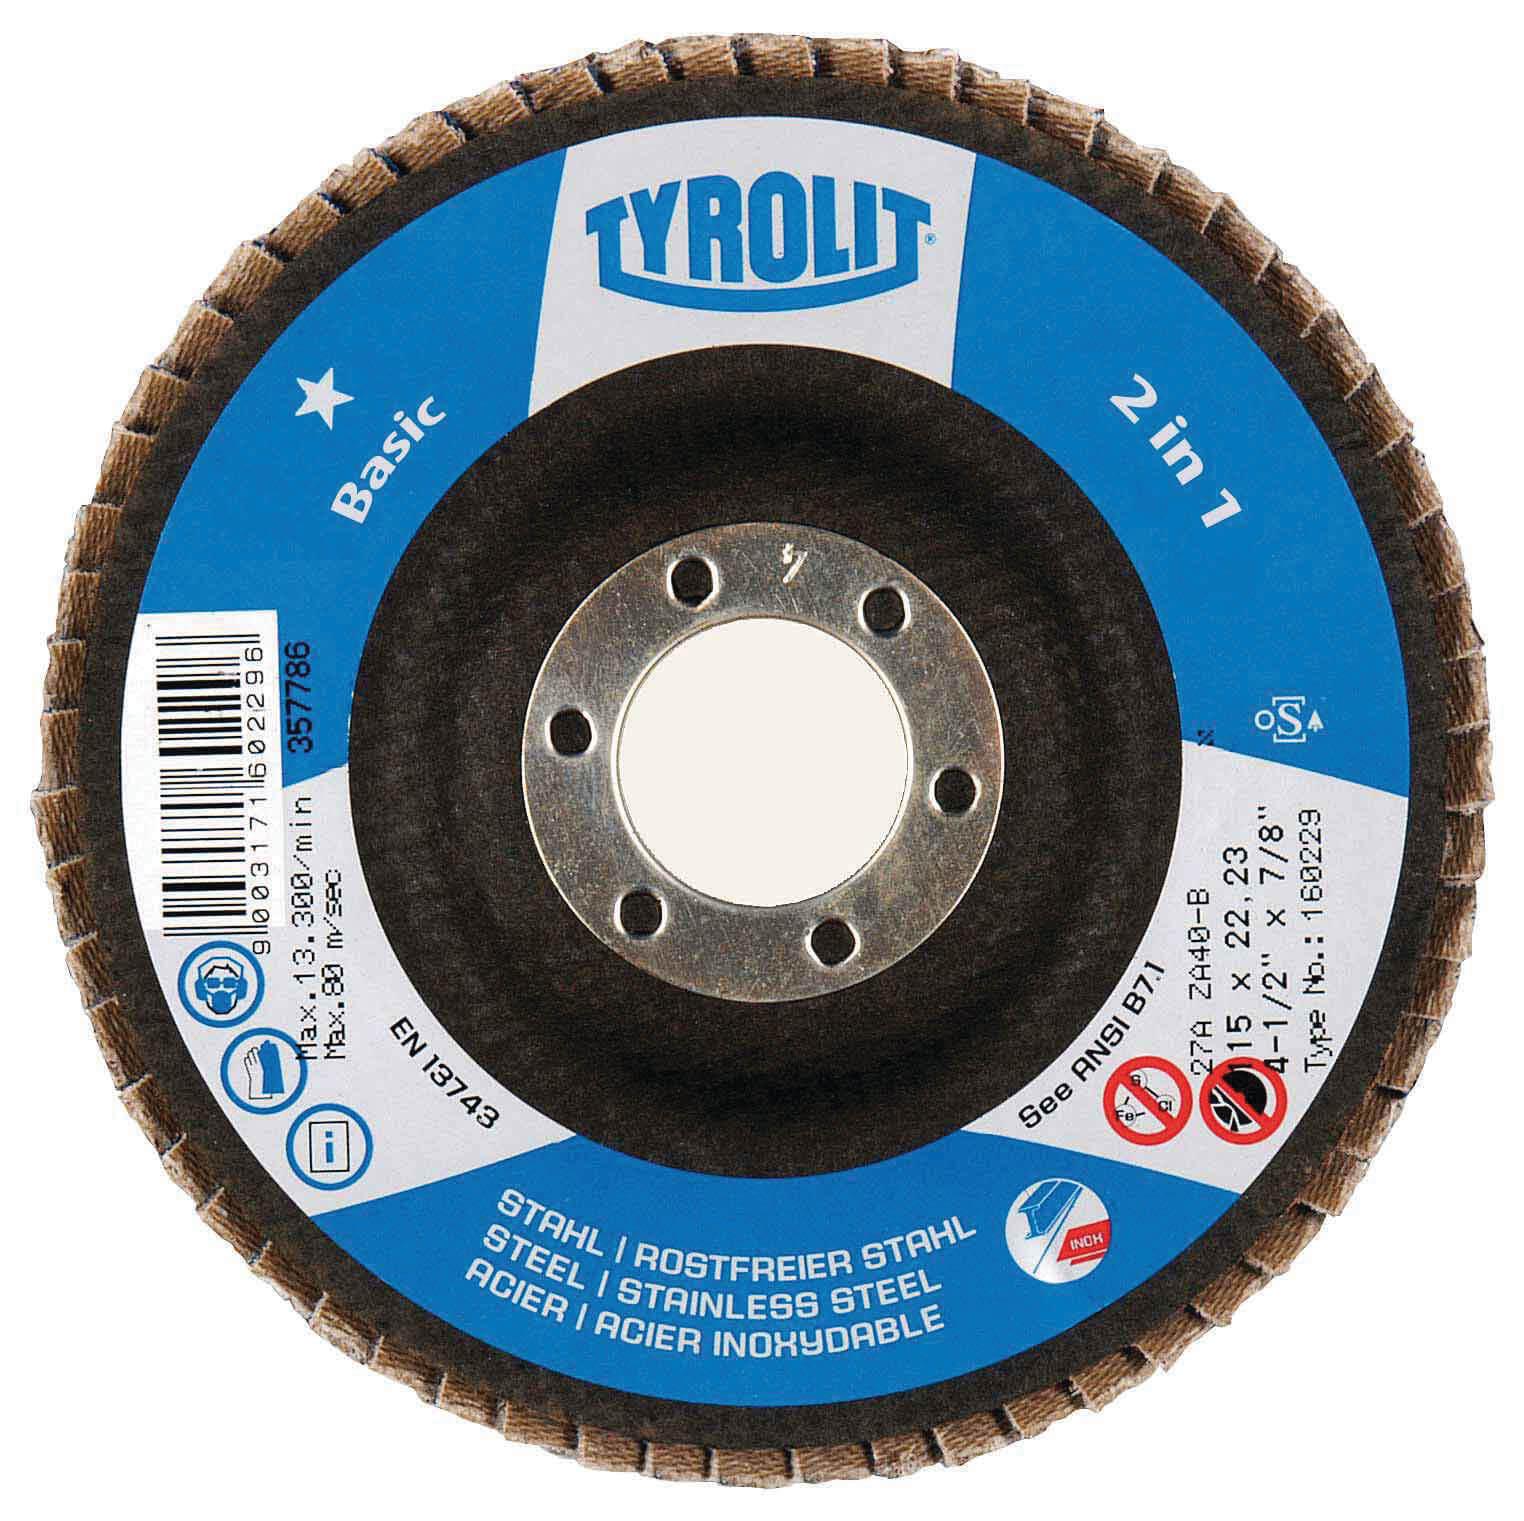 "4-1/2"" x 7/8"" Tyrolit Basic 2 in 1 Zirconia Flap Disc"